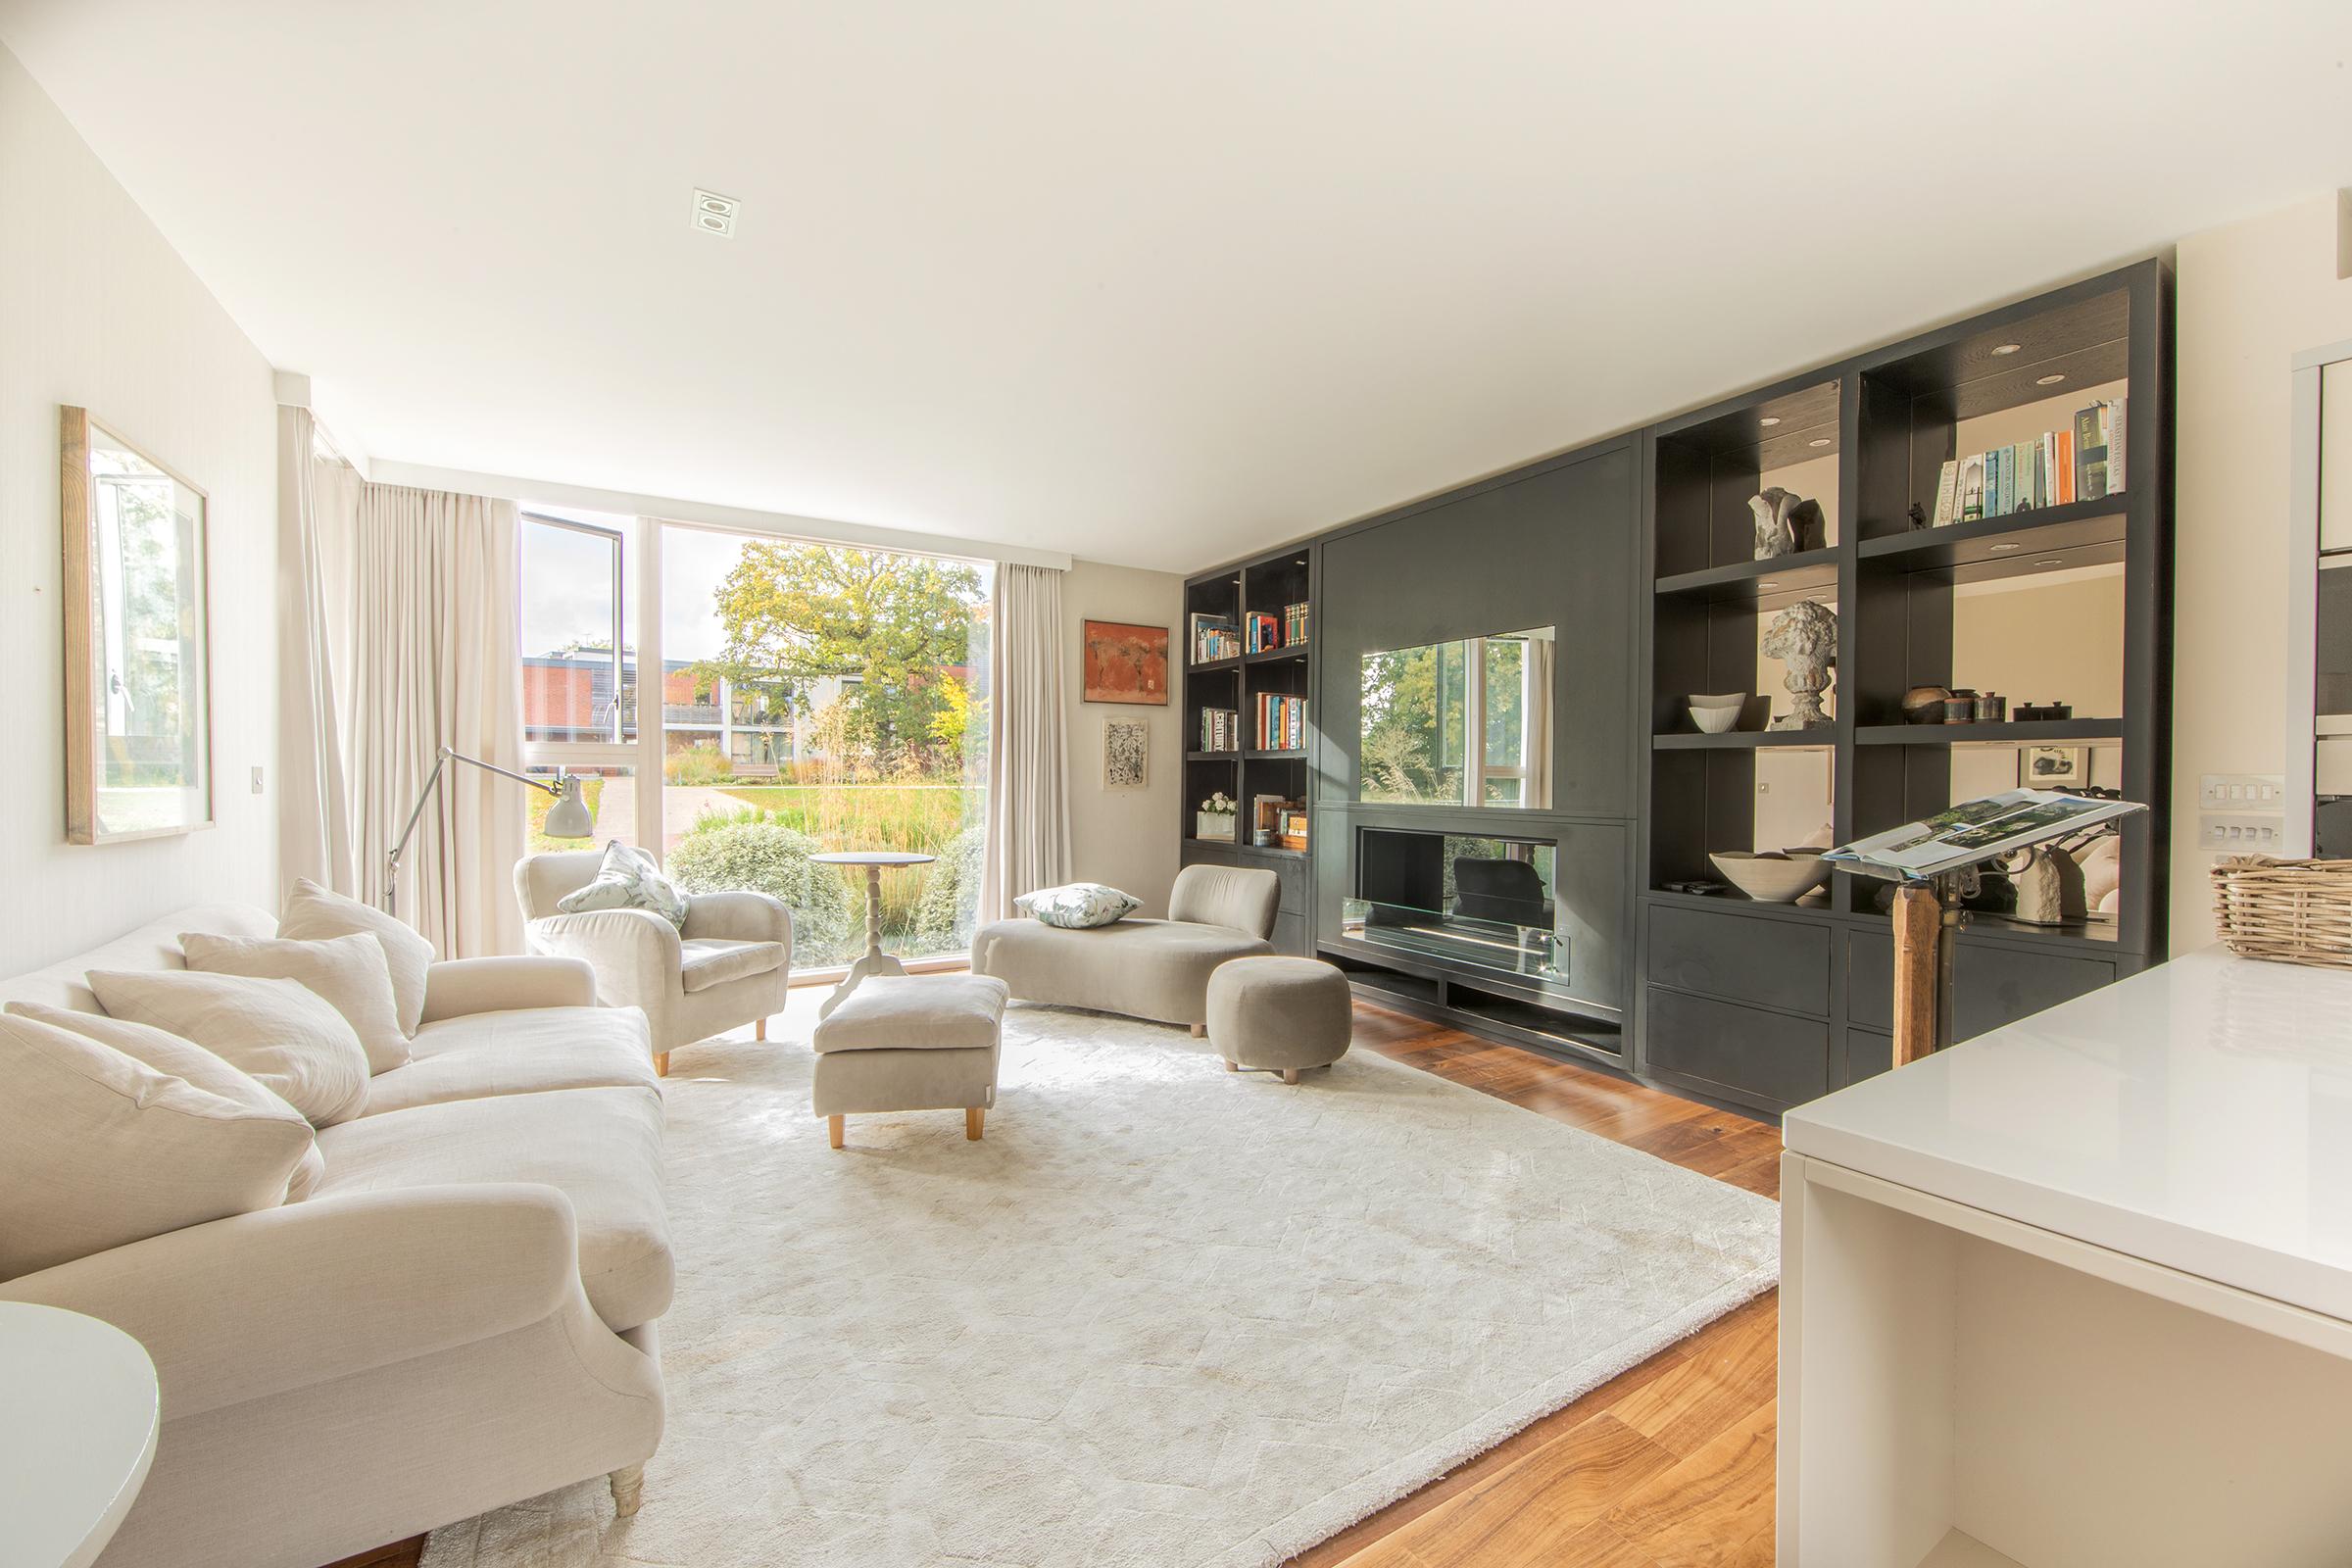 38 Rowan Lane – Two Bedroom Apartment